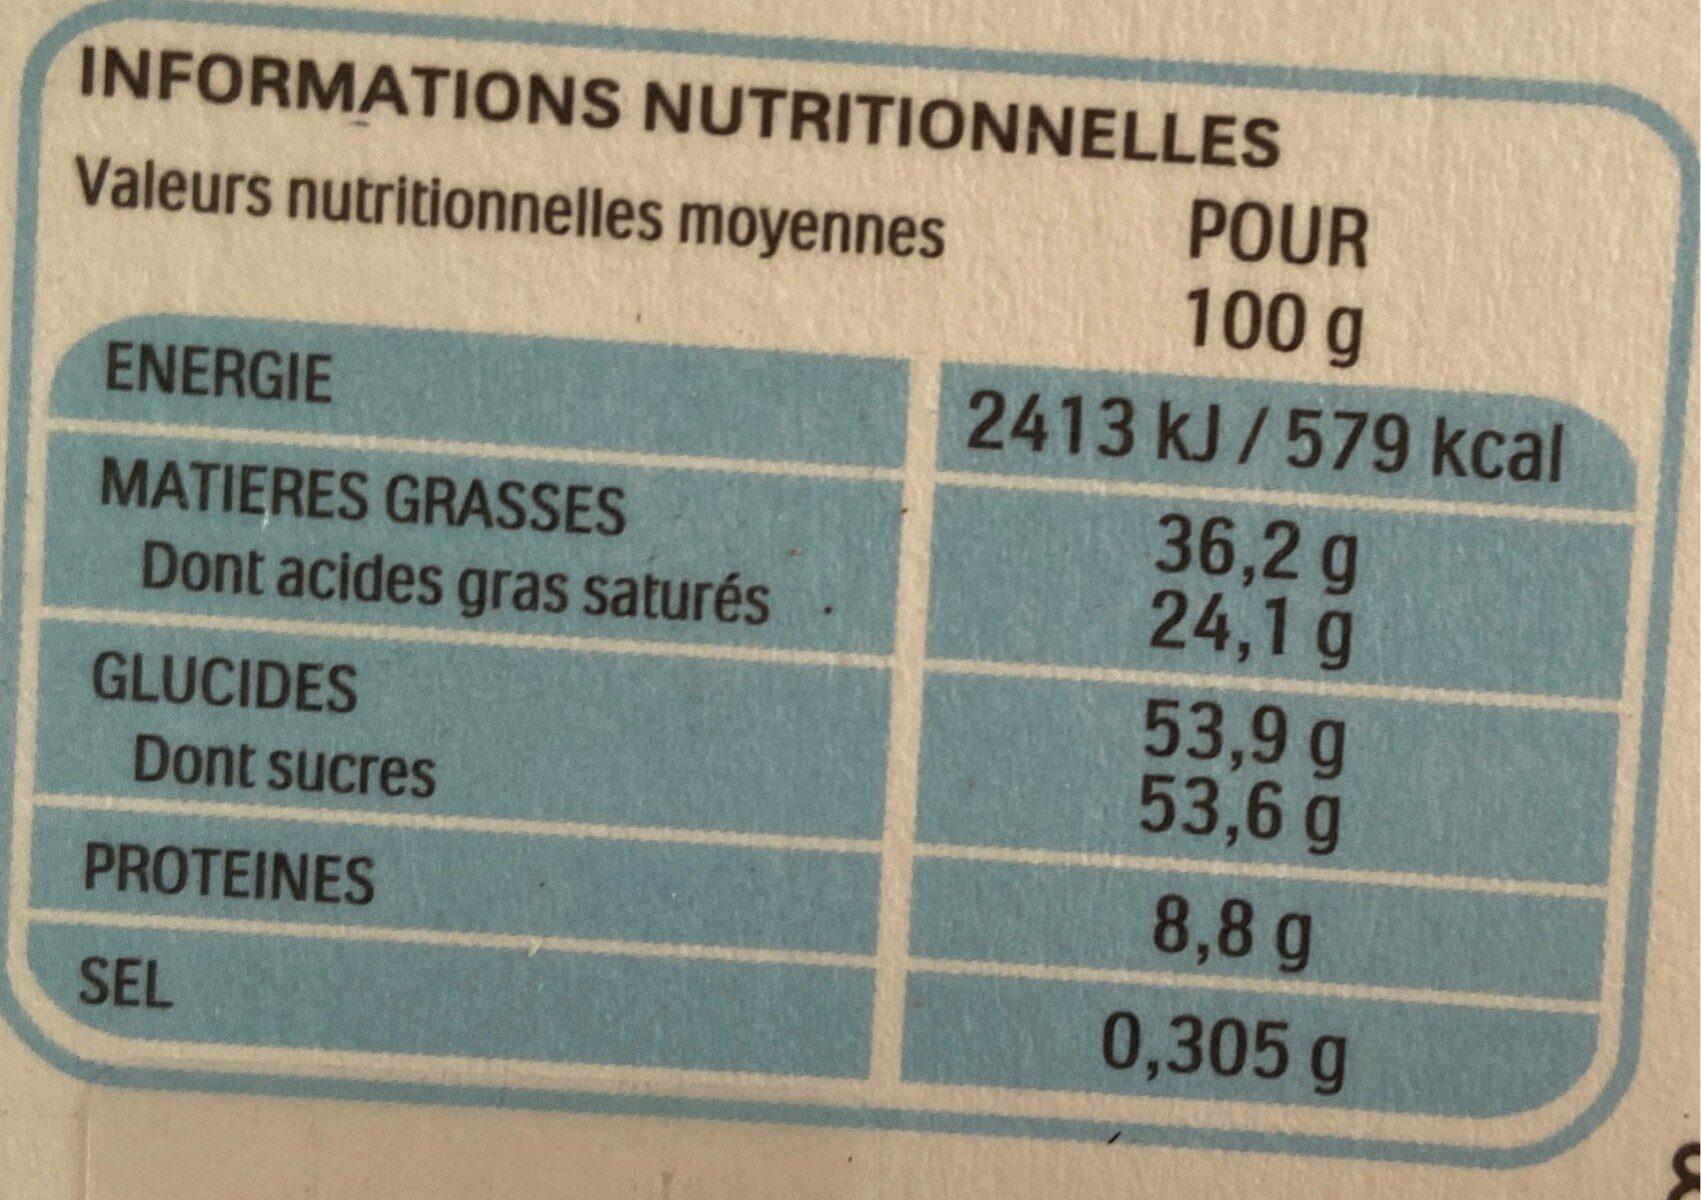 Kinder mix bunny house 155g maison lapin - Valori nutrizionali - fr